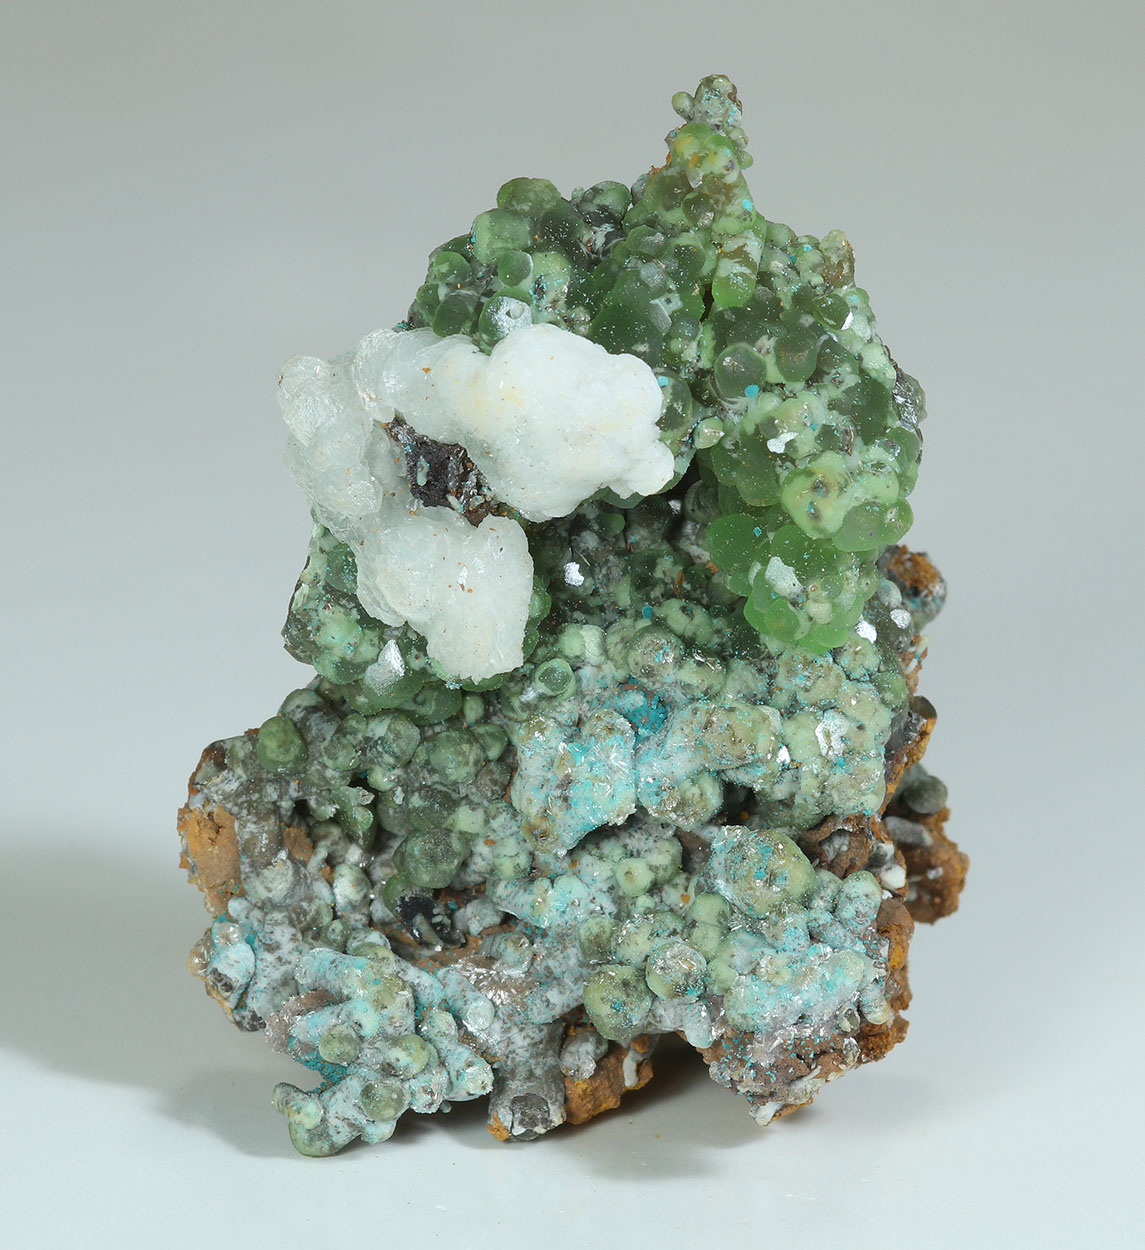 Smithsonite Aurichalcite Hemimorphite & Aragonite